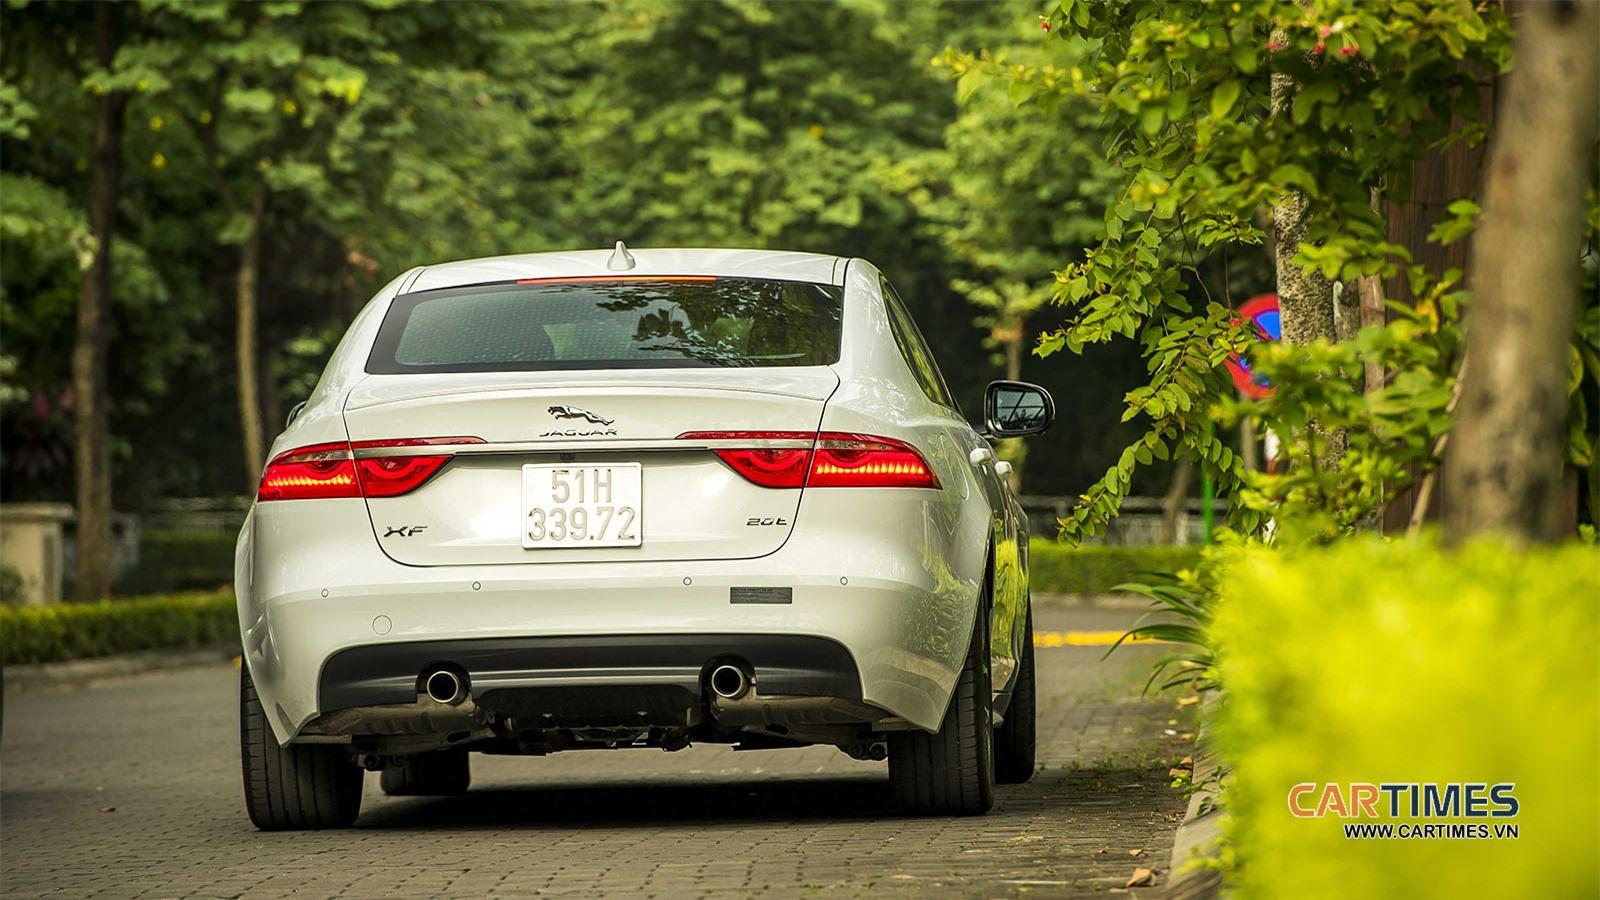 Thiết kế đuôi xe Jaguar XF R-Sport